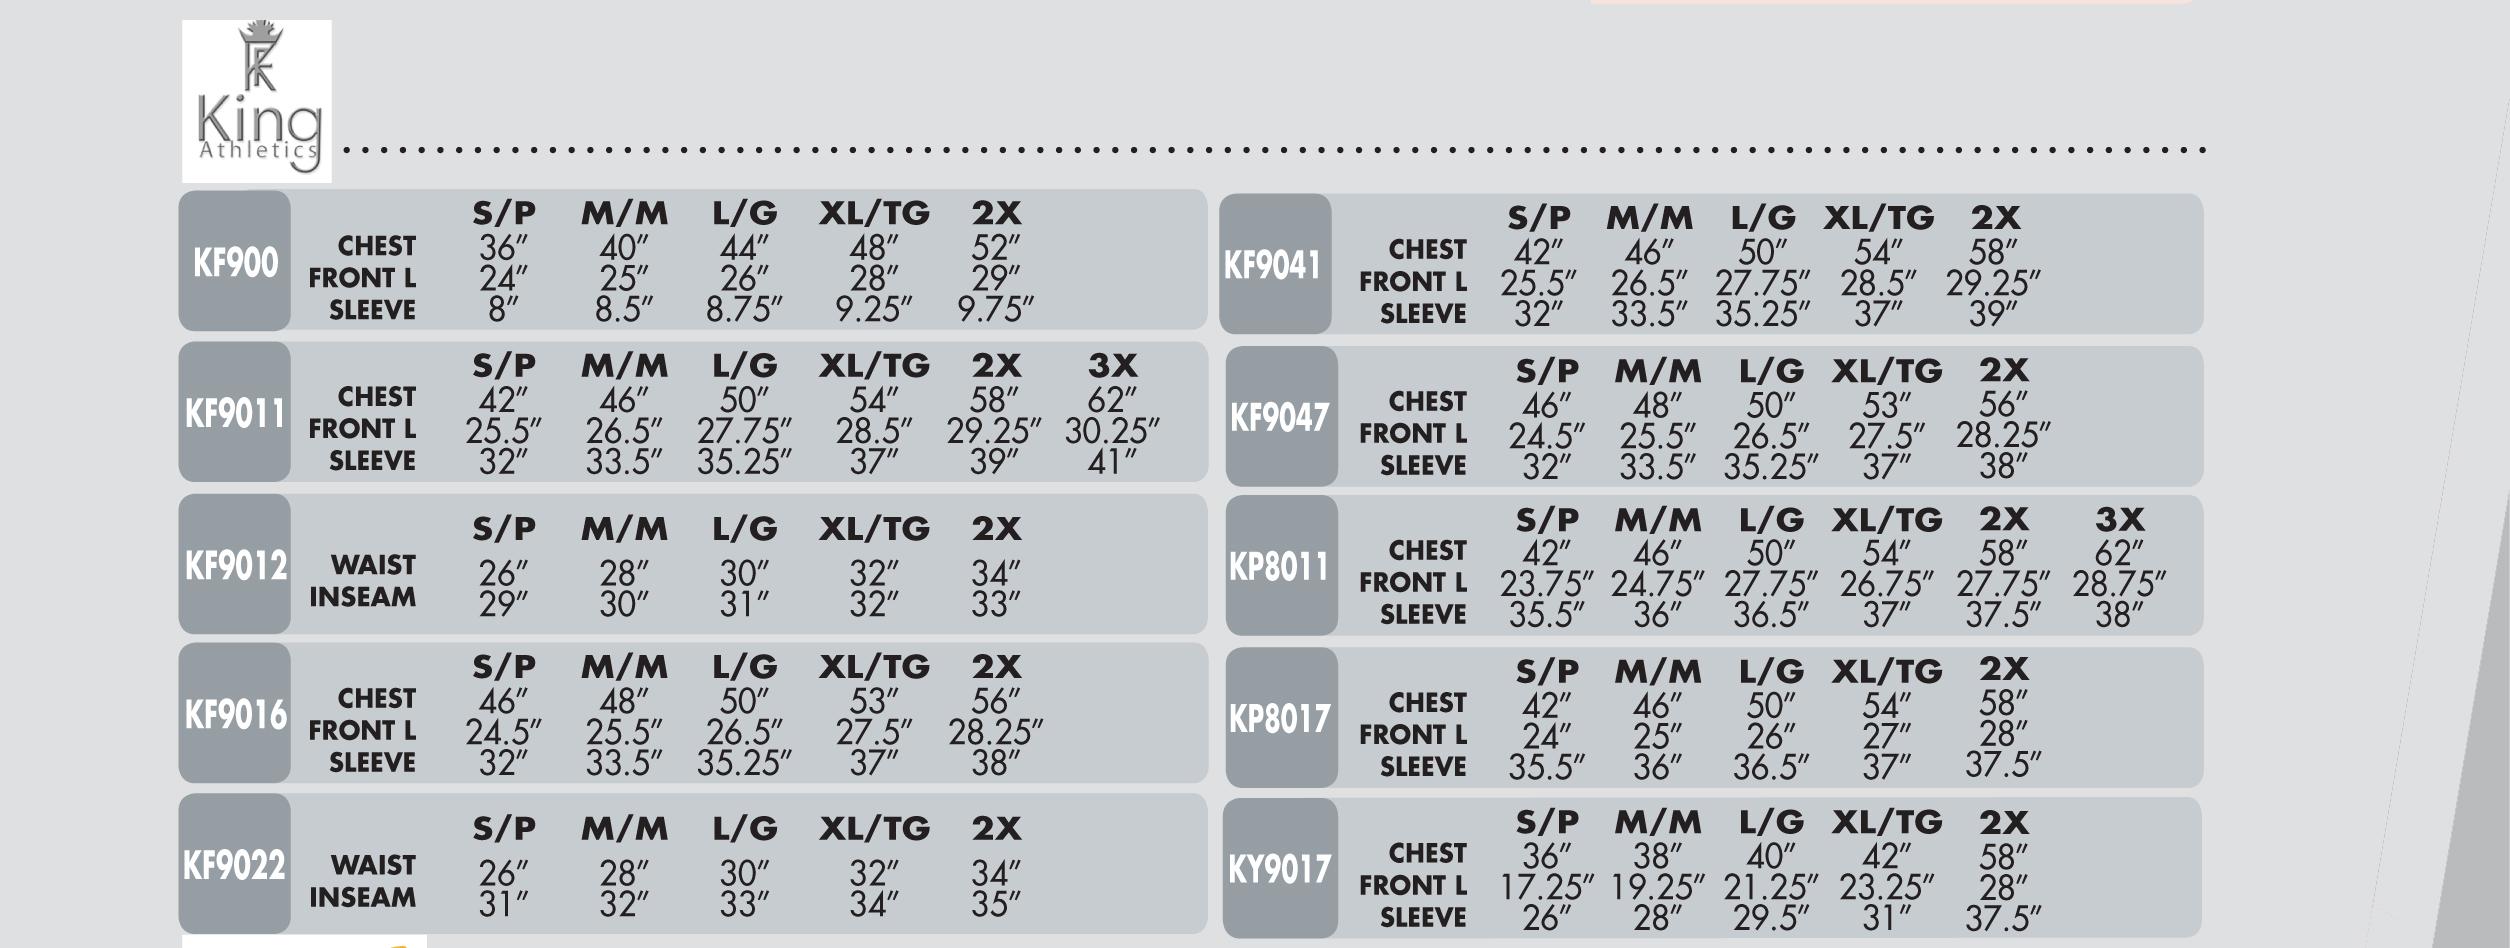 King Athletics Size Chart